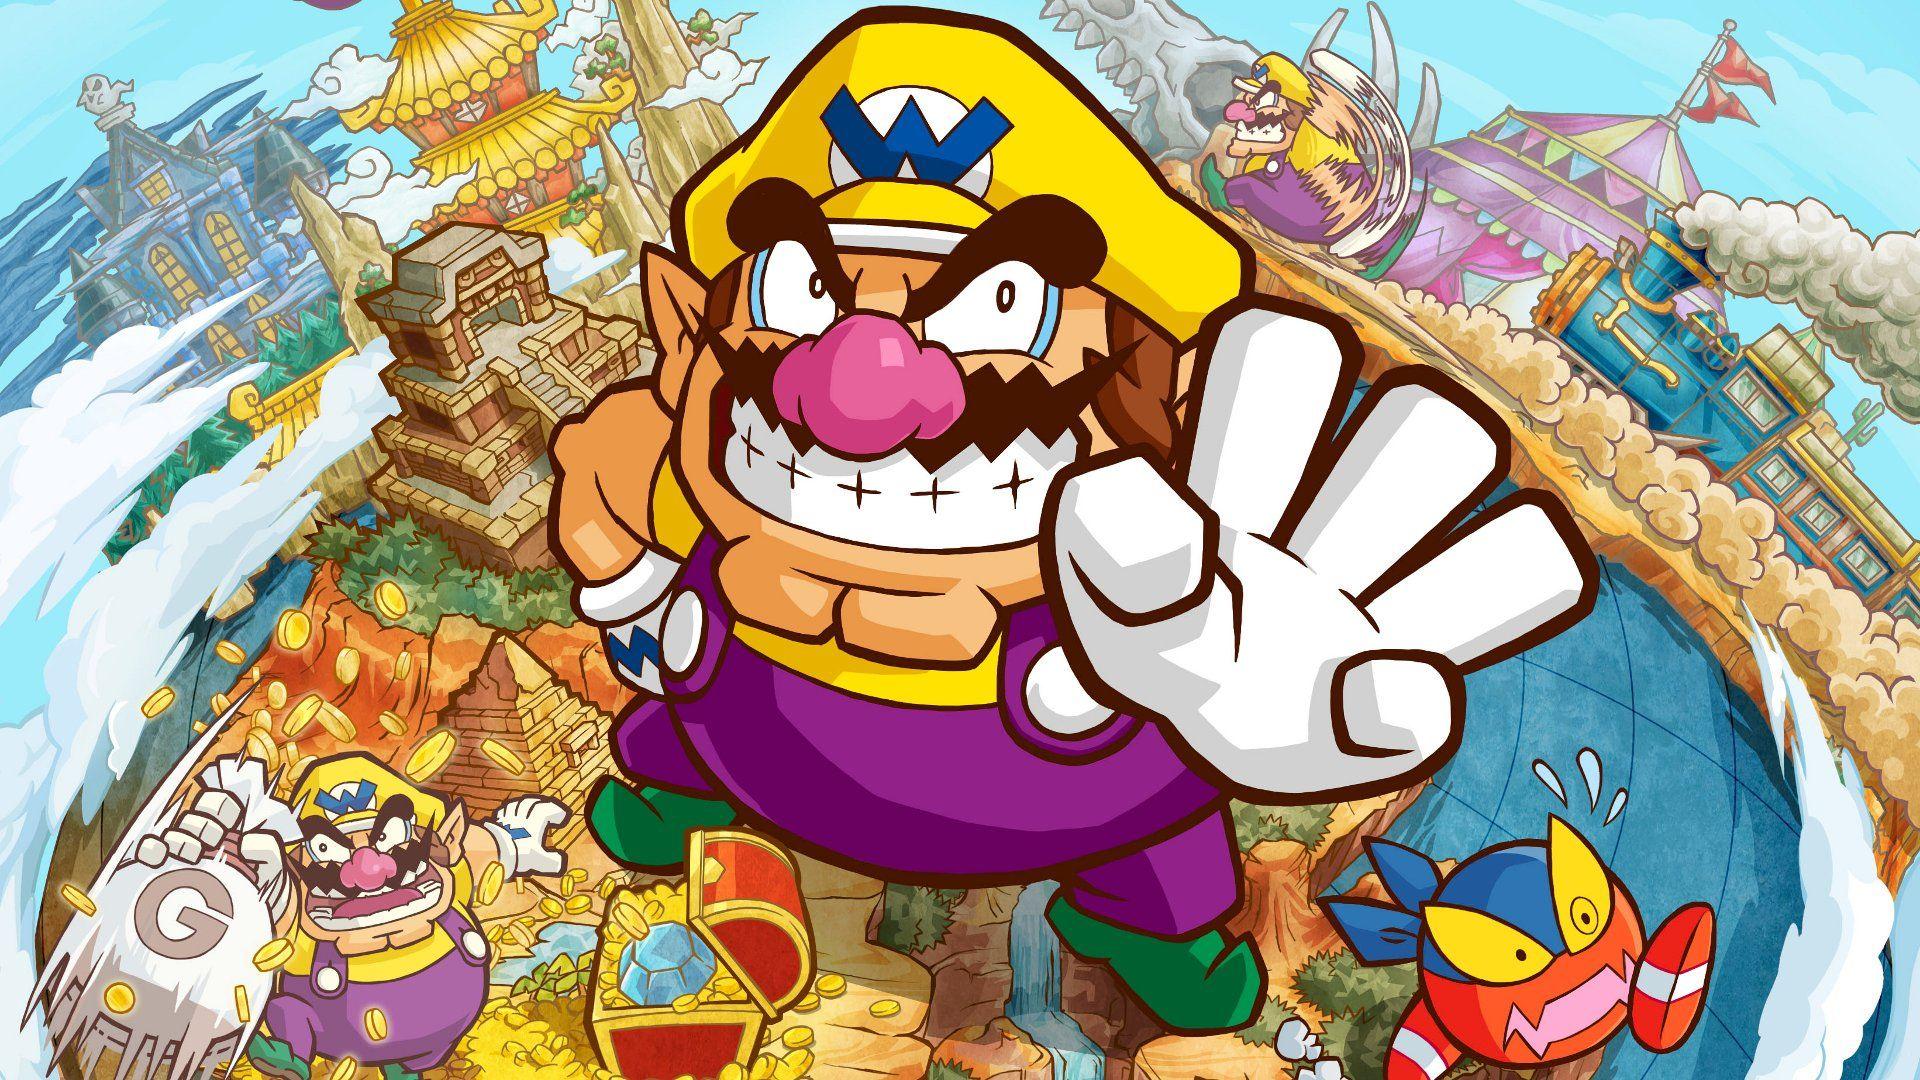 Nintendo Applied For  Trademarks Including Wario Land General News Nintendoreporters Shake Itcenter Stagevideo Gamesgamingwallpapernintendo